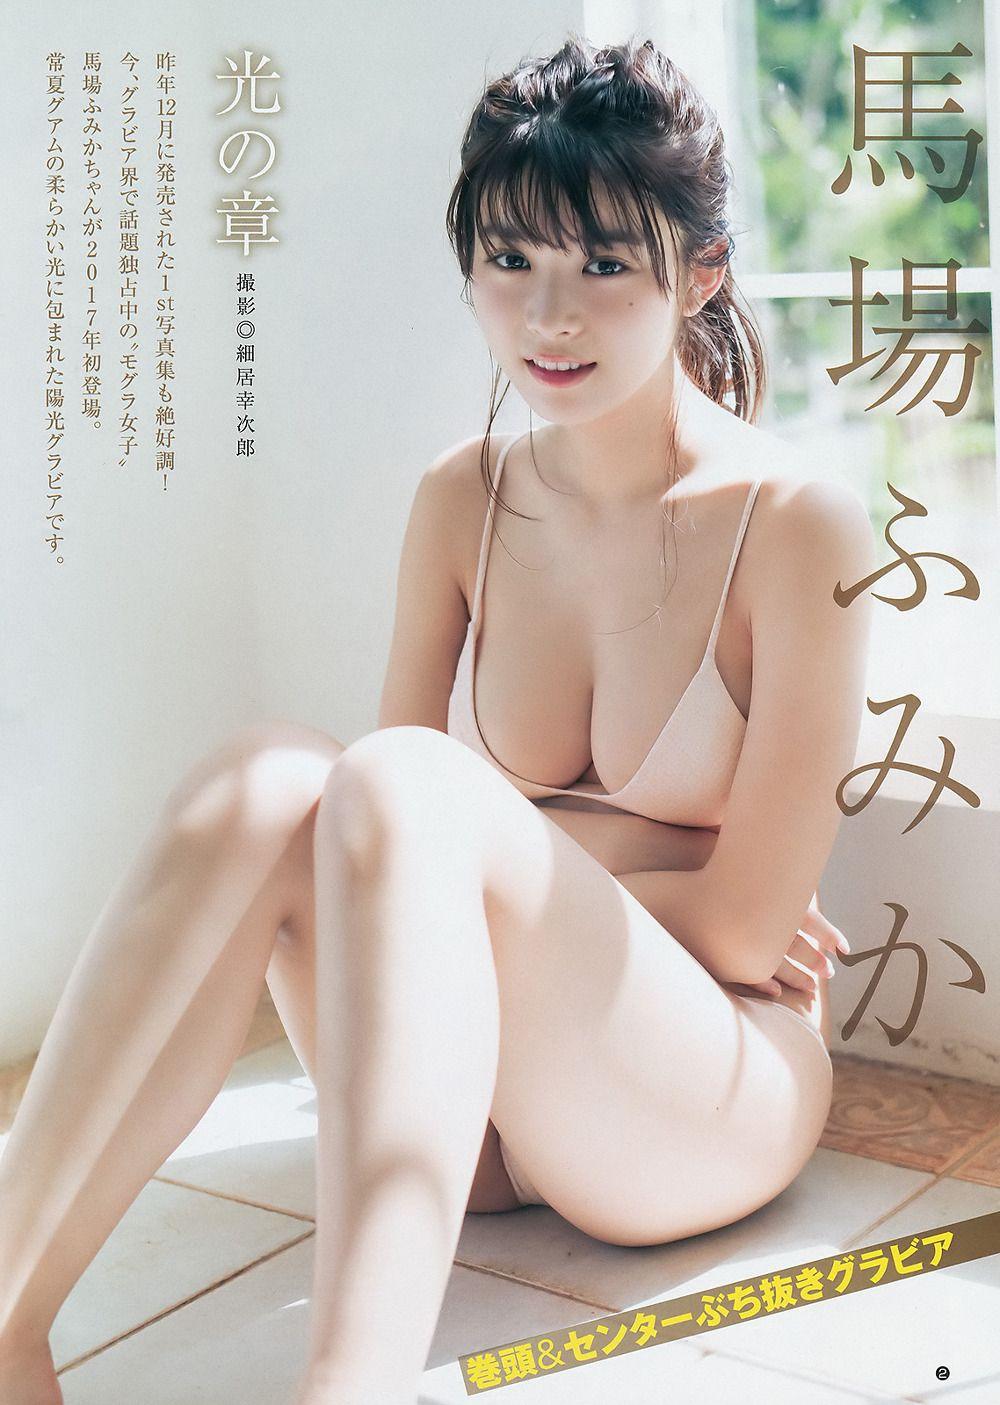 Fumika Baba 馬場ふみか 연예인 아이돌 Pinterest